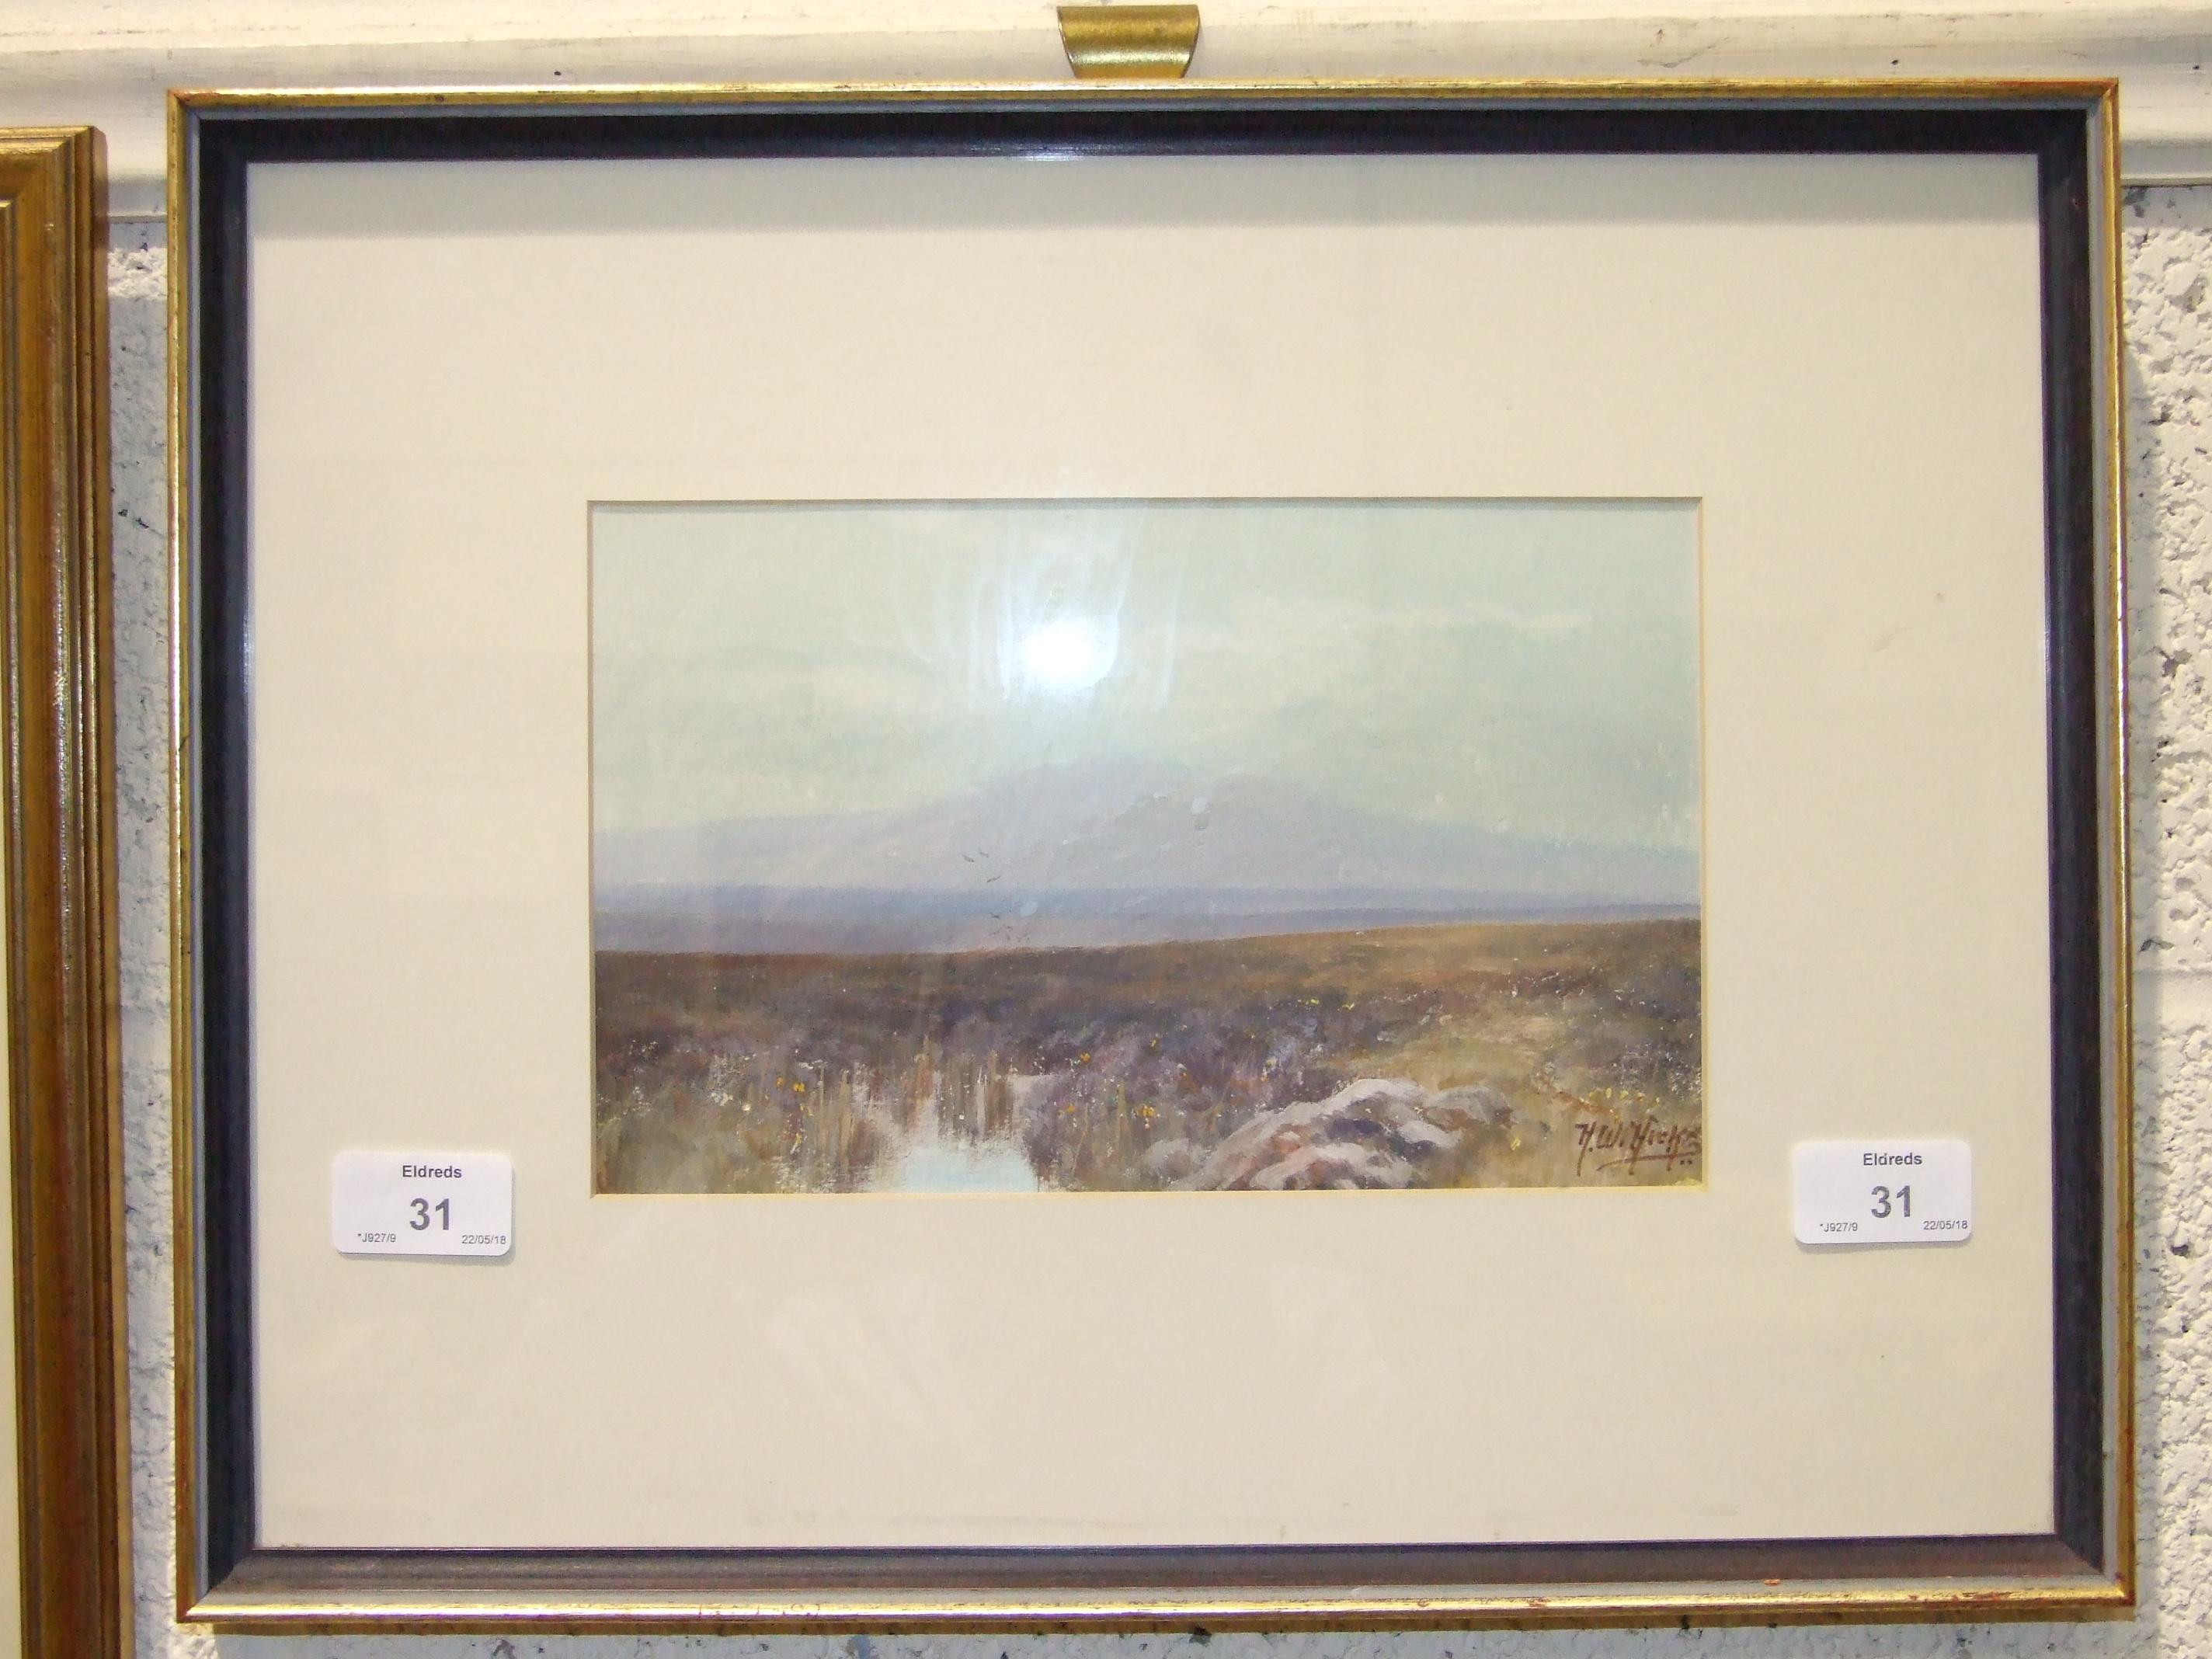 Herbert William Hicks (1880-1944) YES TOR, DARTMOOR Signed watercolour, 14.5 x 23cm. - Image 2 of 2